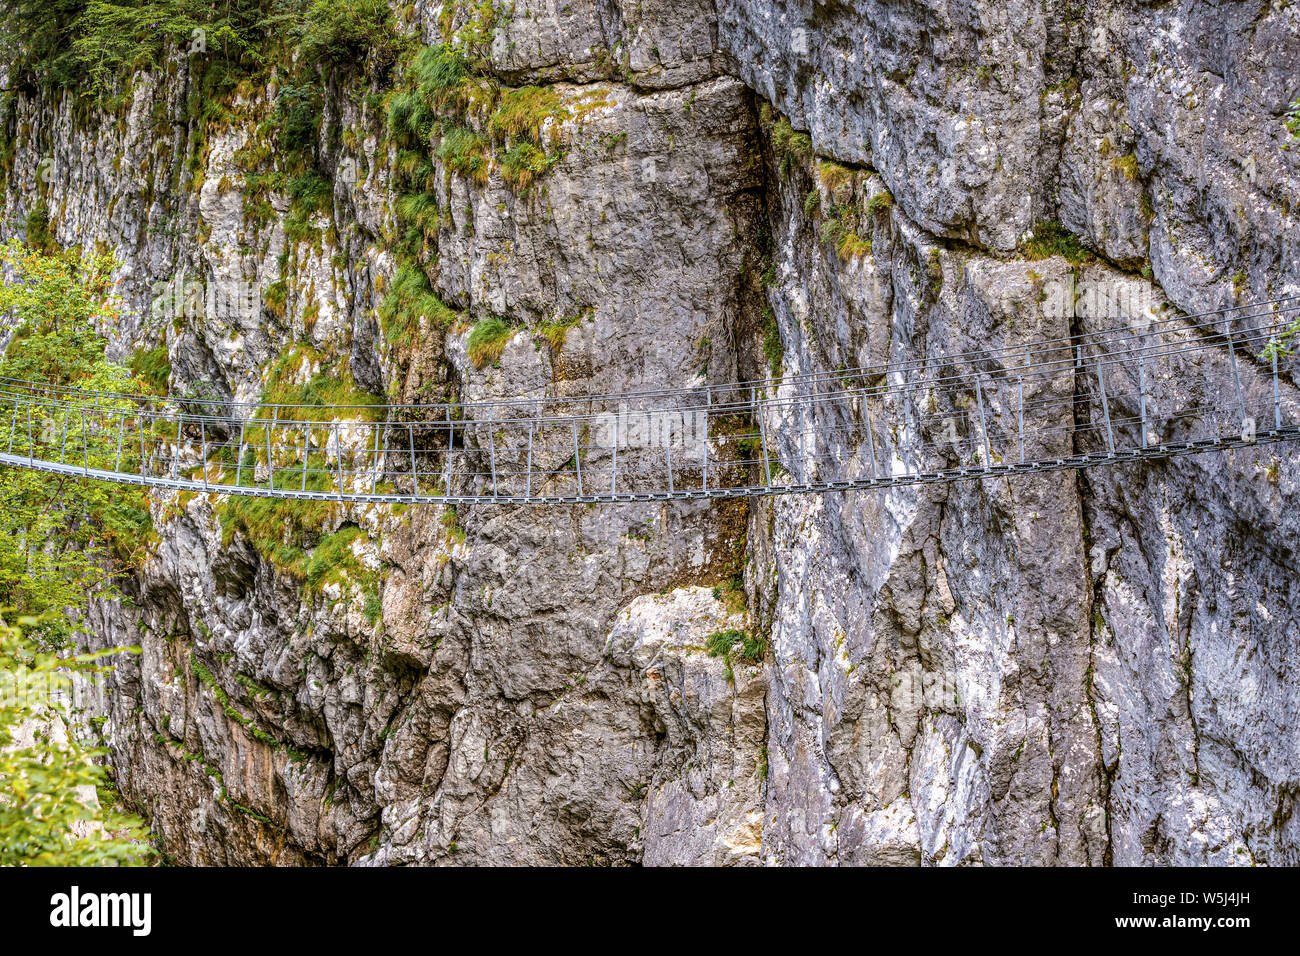 Italien Friaul Barcis Alte Straße von Val Cellina - Himalaya Brücke - Naturpark des Dolomiti Friulane Stockfoto